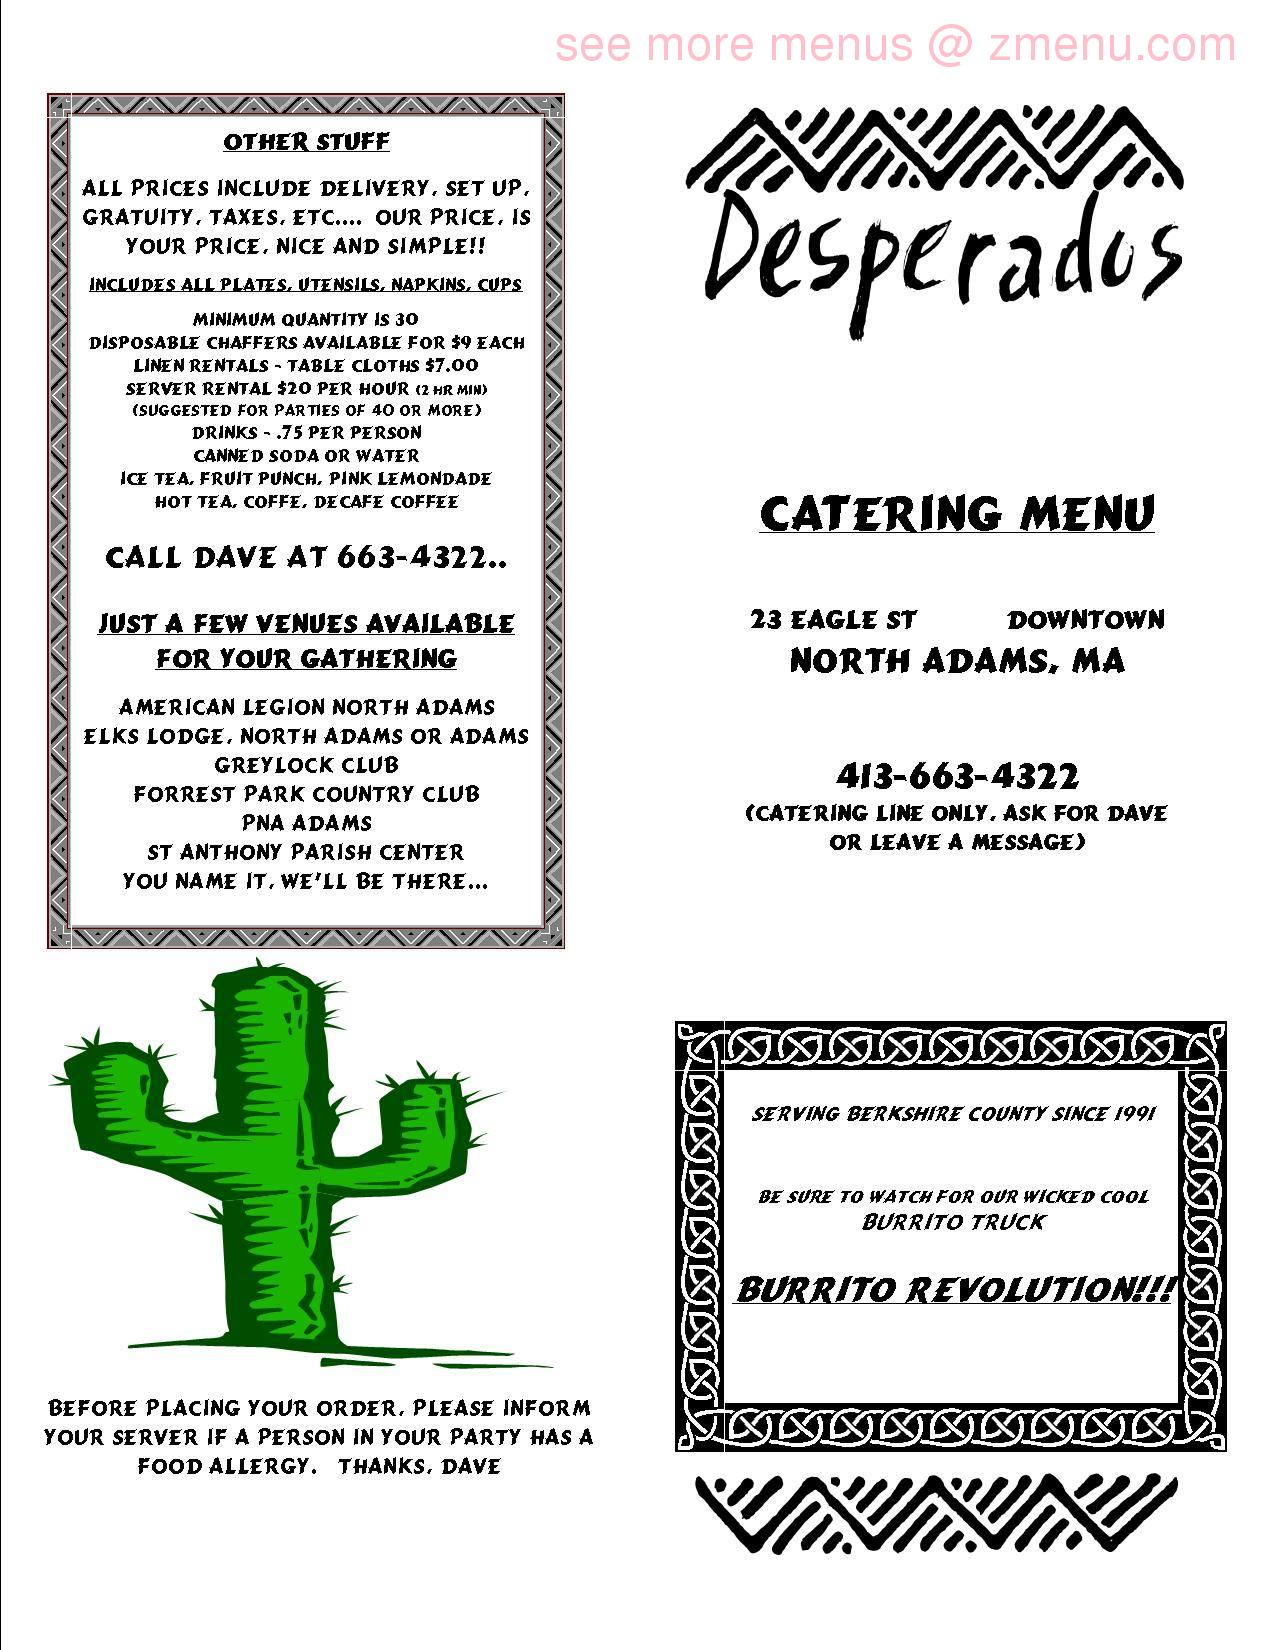 Online Menu Of Desperados Restaurant North Adams Massachusetts 01247 Zmenu